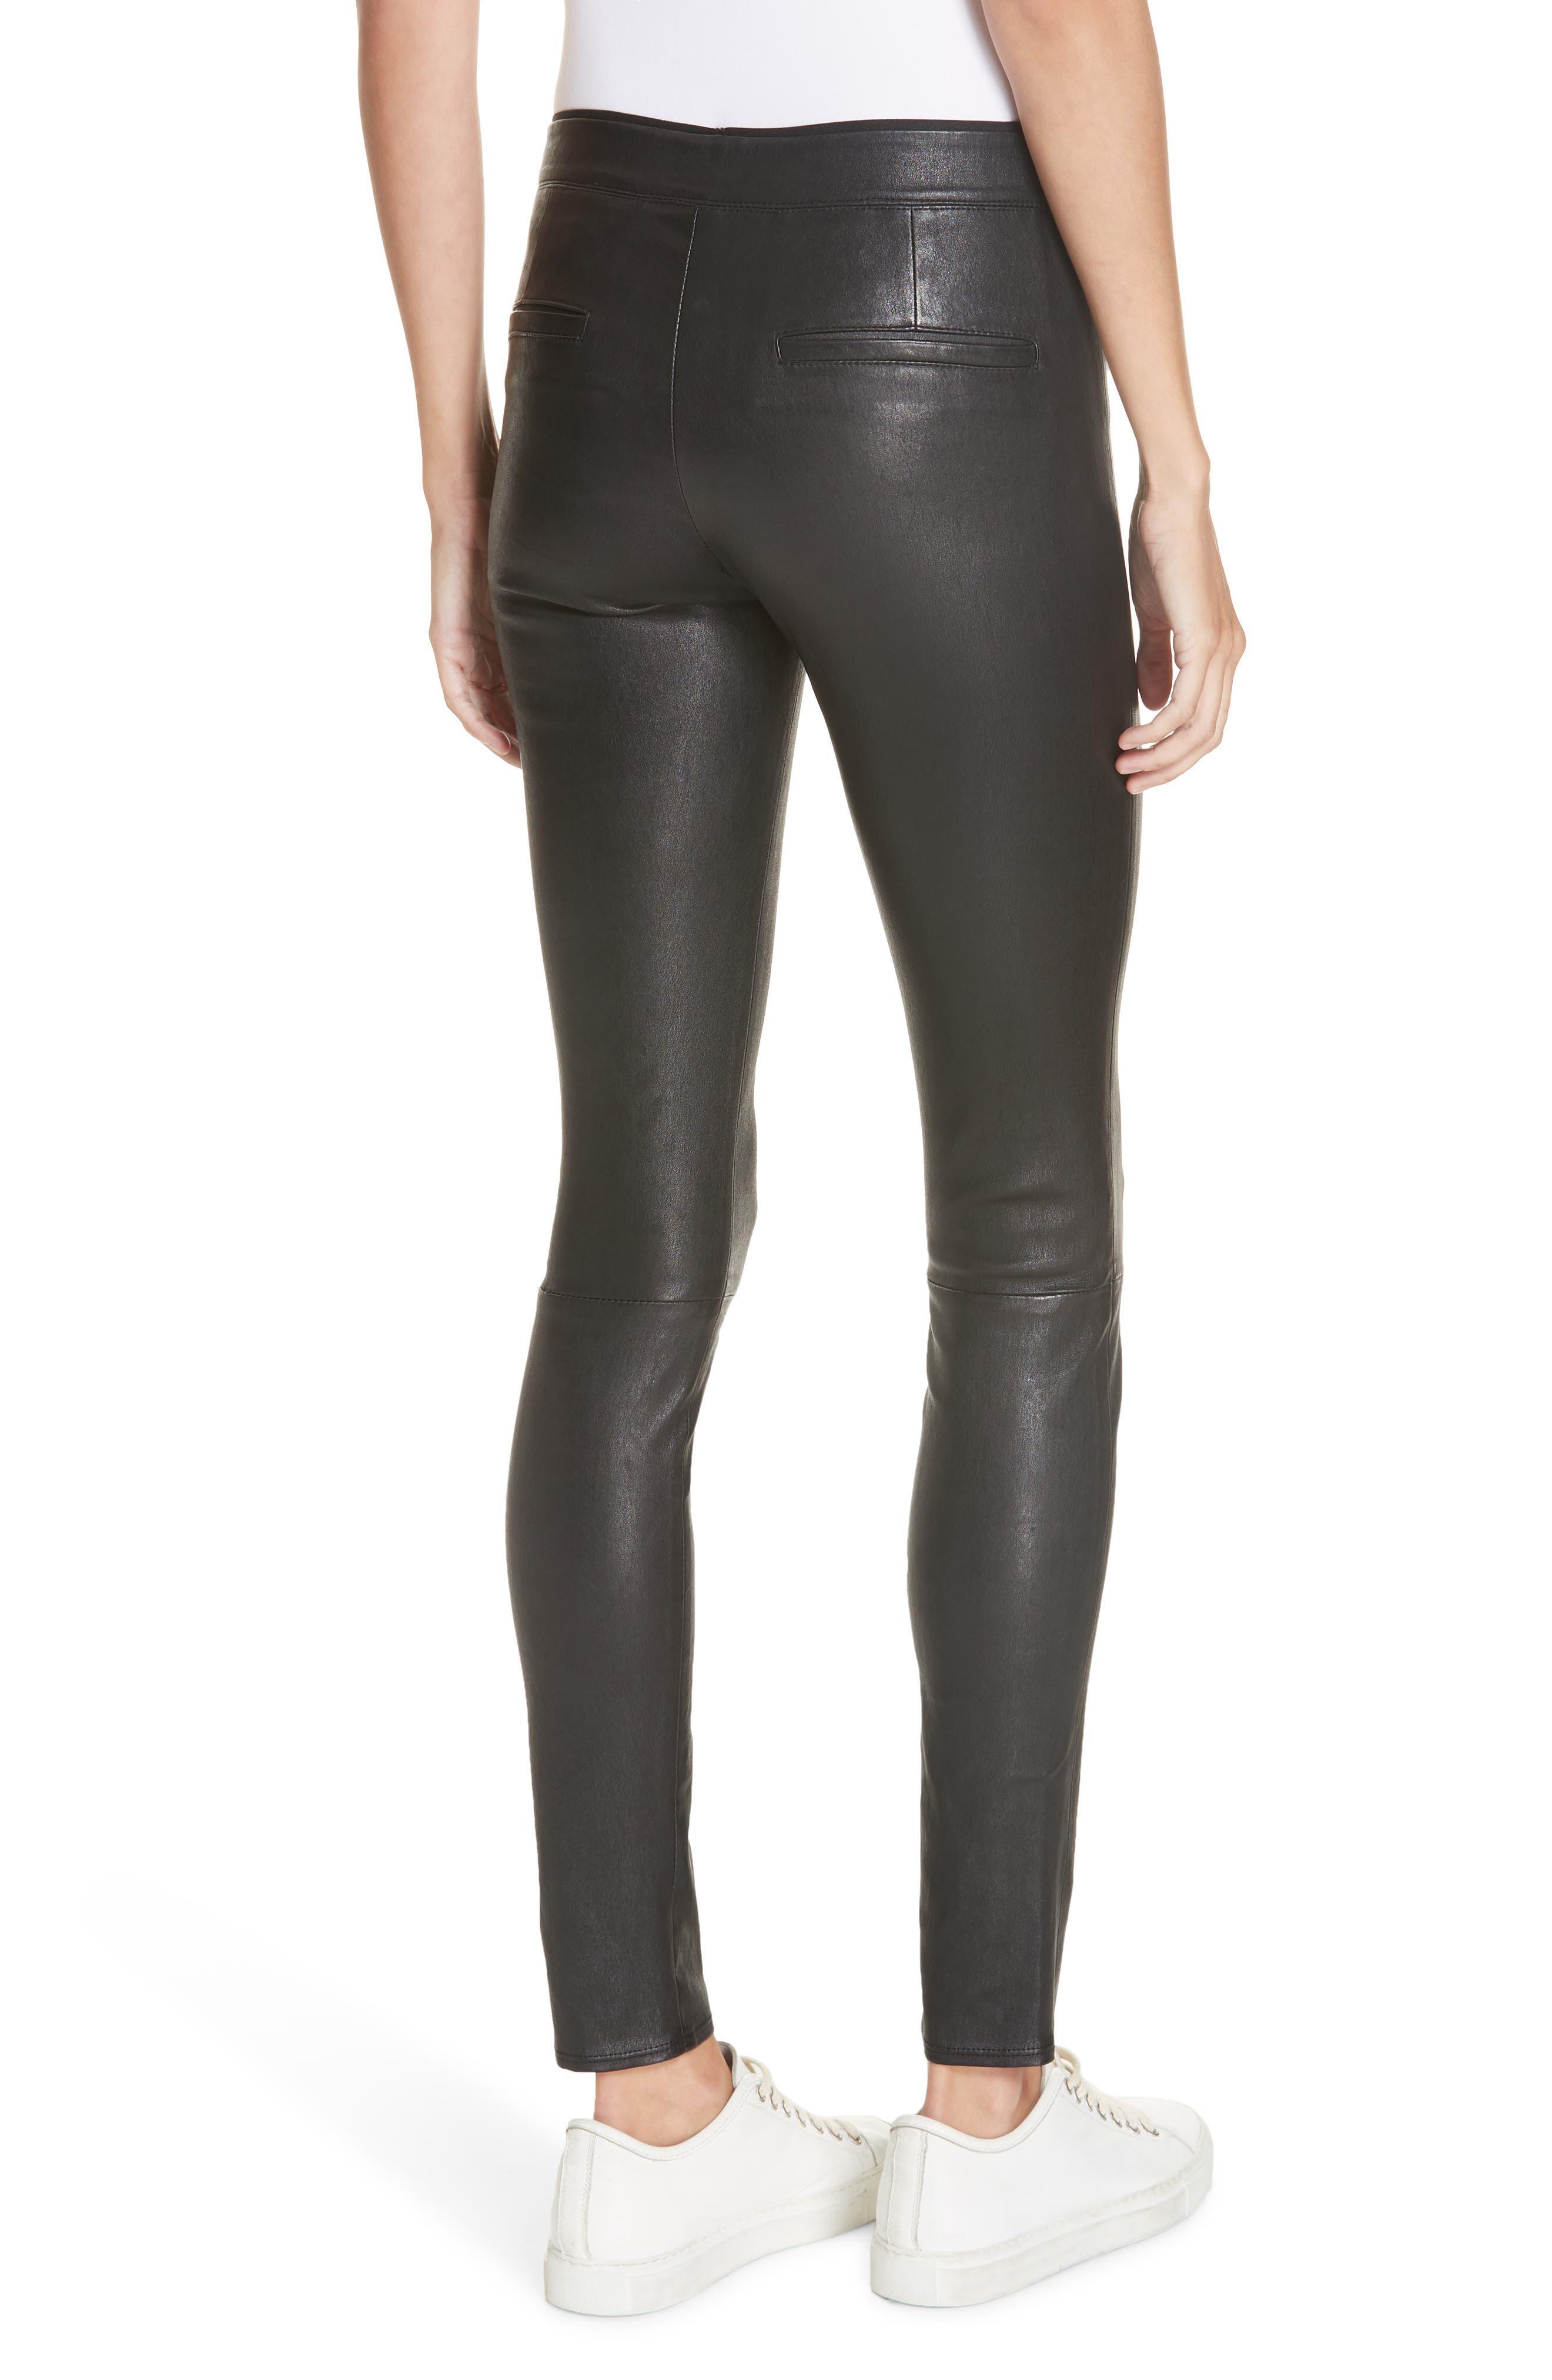 HELMUT LANG, Stretch Lambskin Leather Leggings, Alternate thumbnail 2, color, BLACK